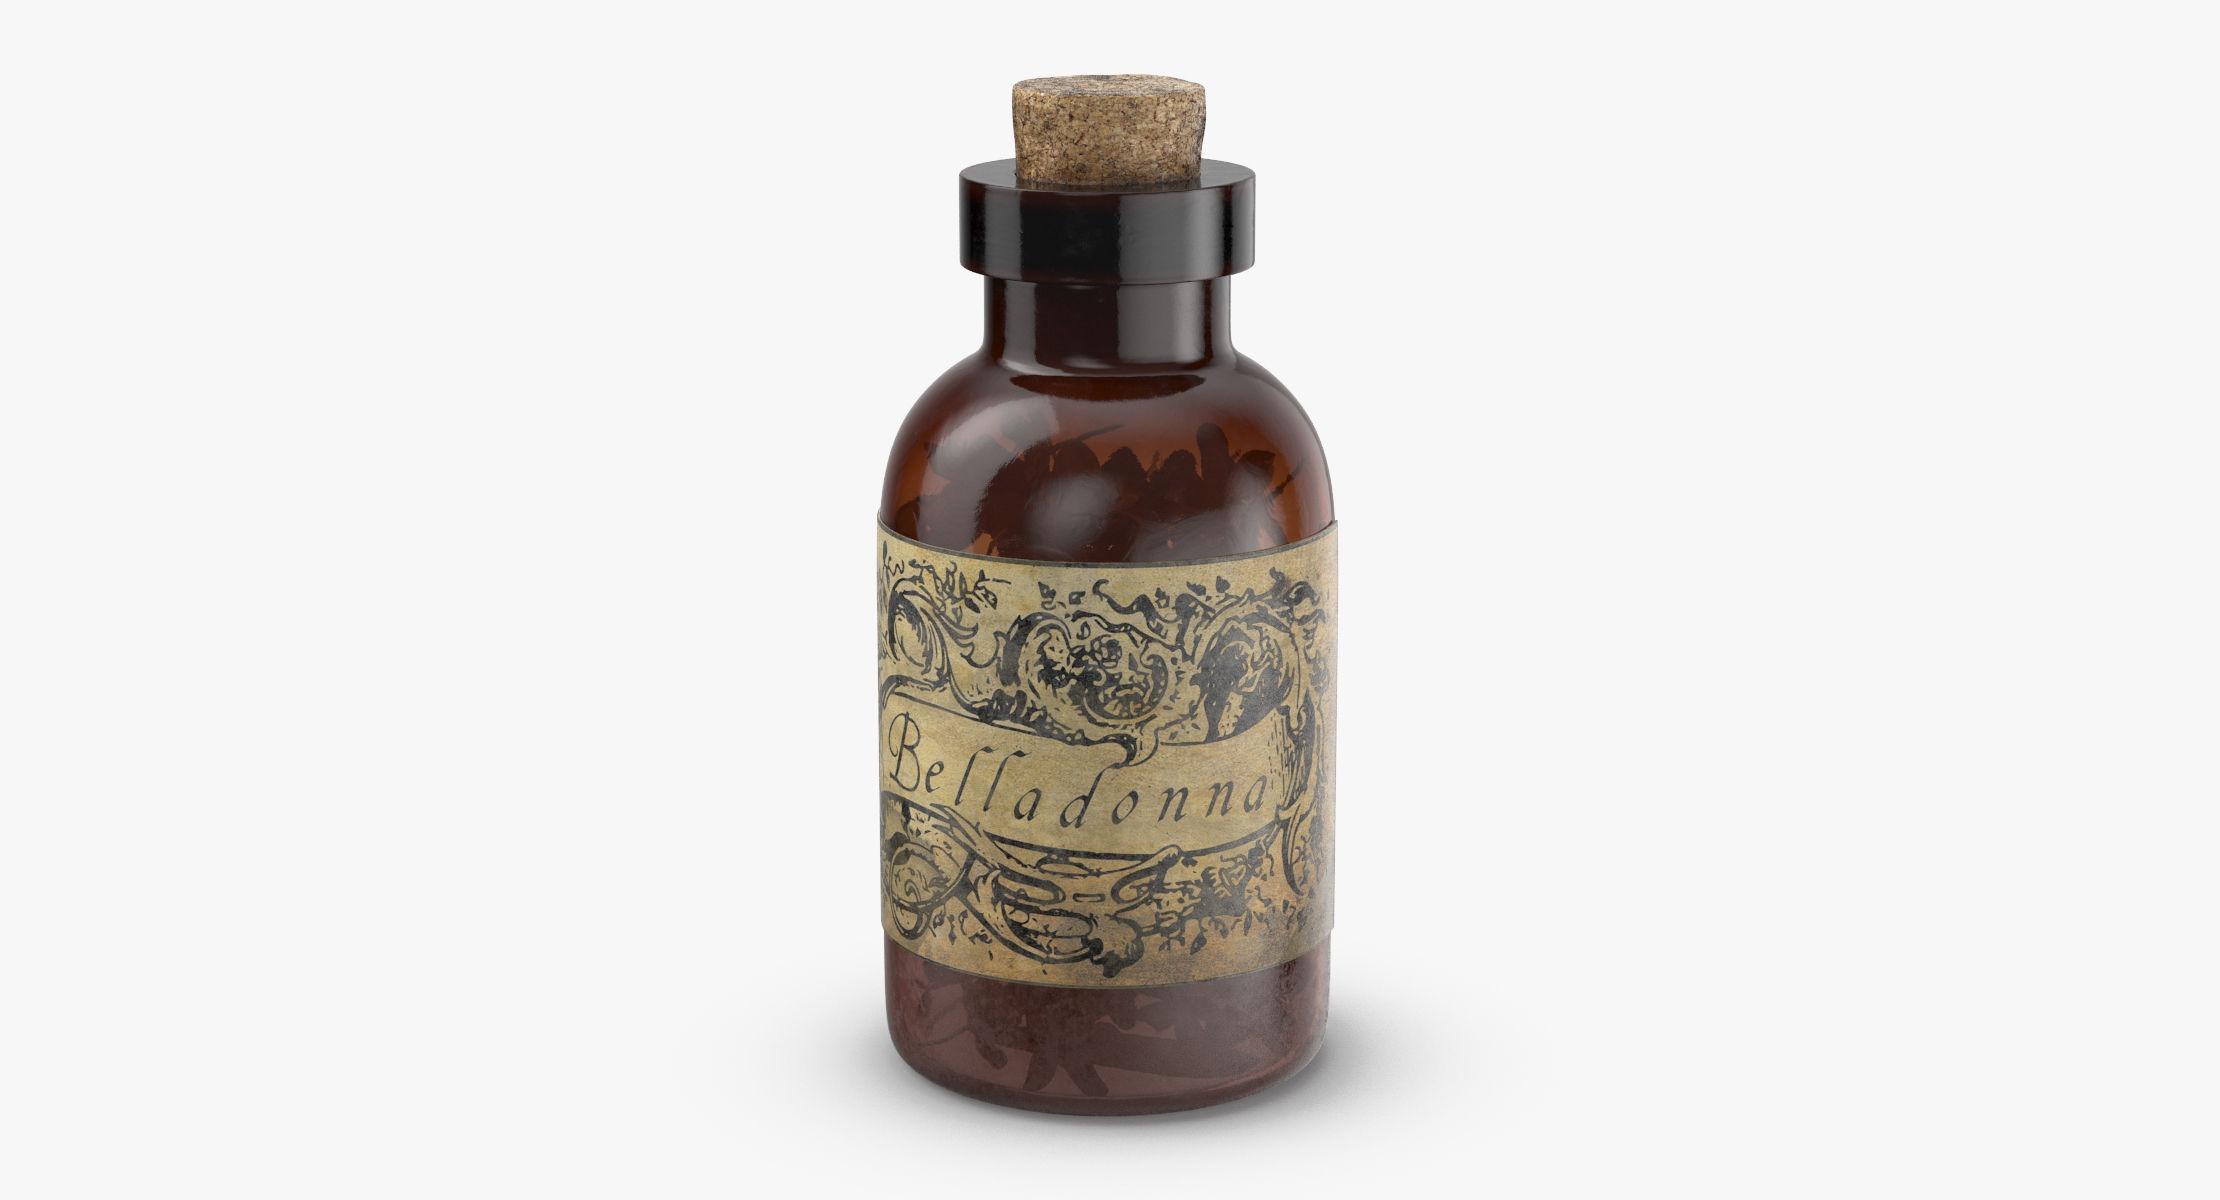 Potion Ingredient Jar - Belladonna - reel 1